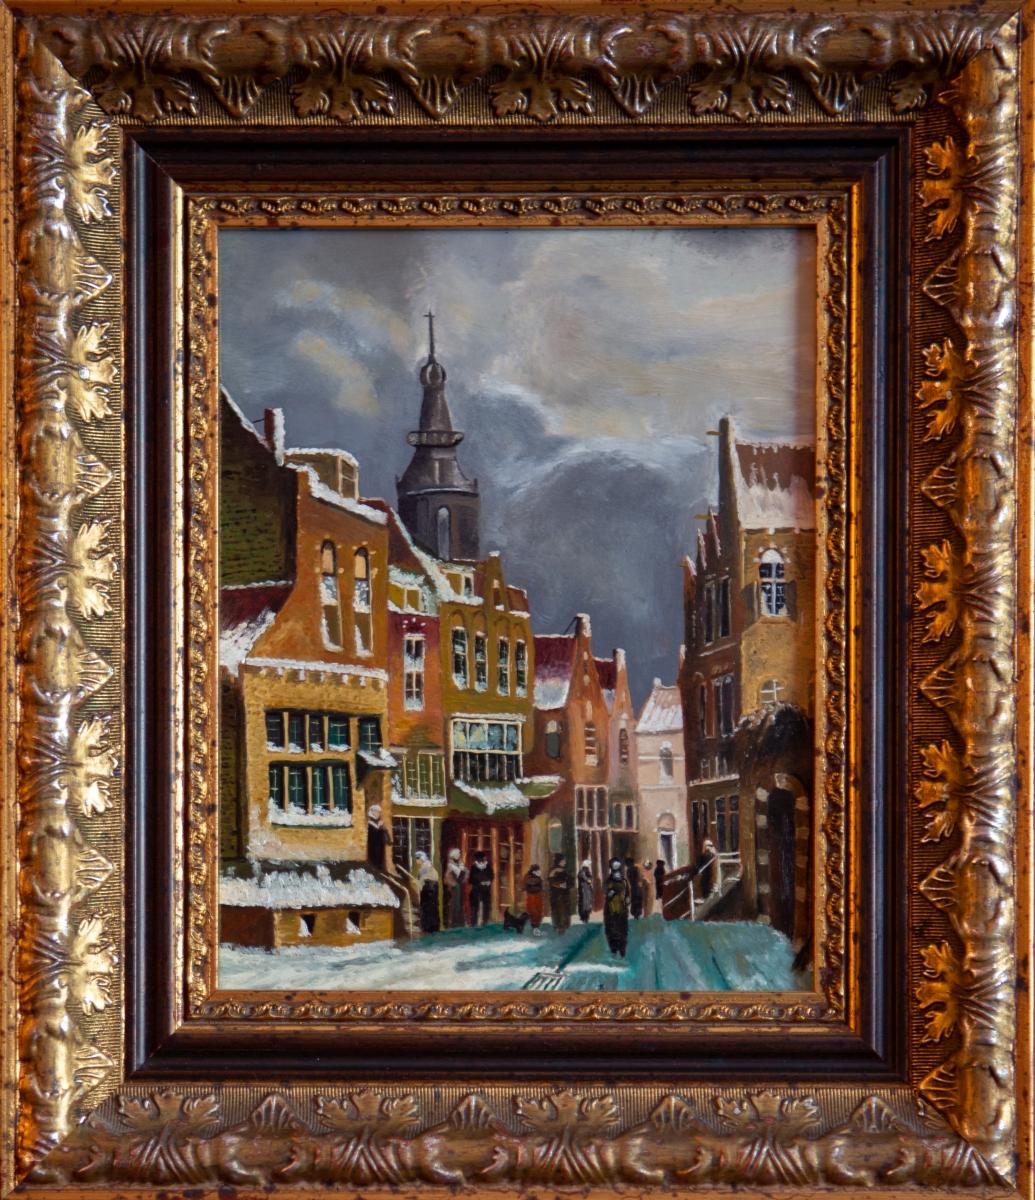 Winters stadsgezicht 1819-1893 van Petrus Gerardus Vertin (2013)